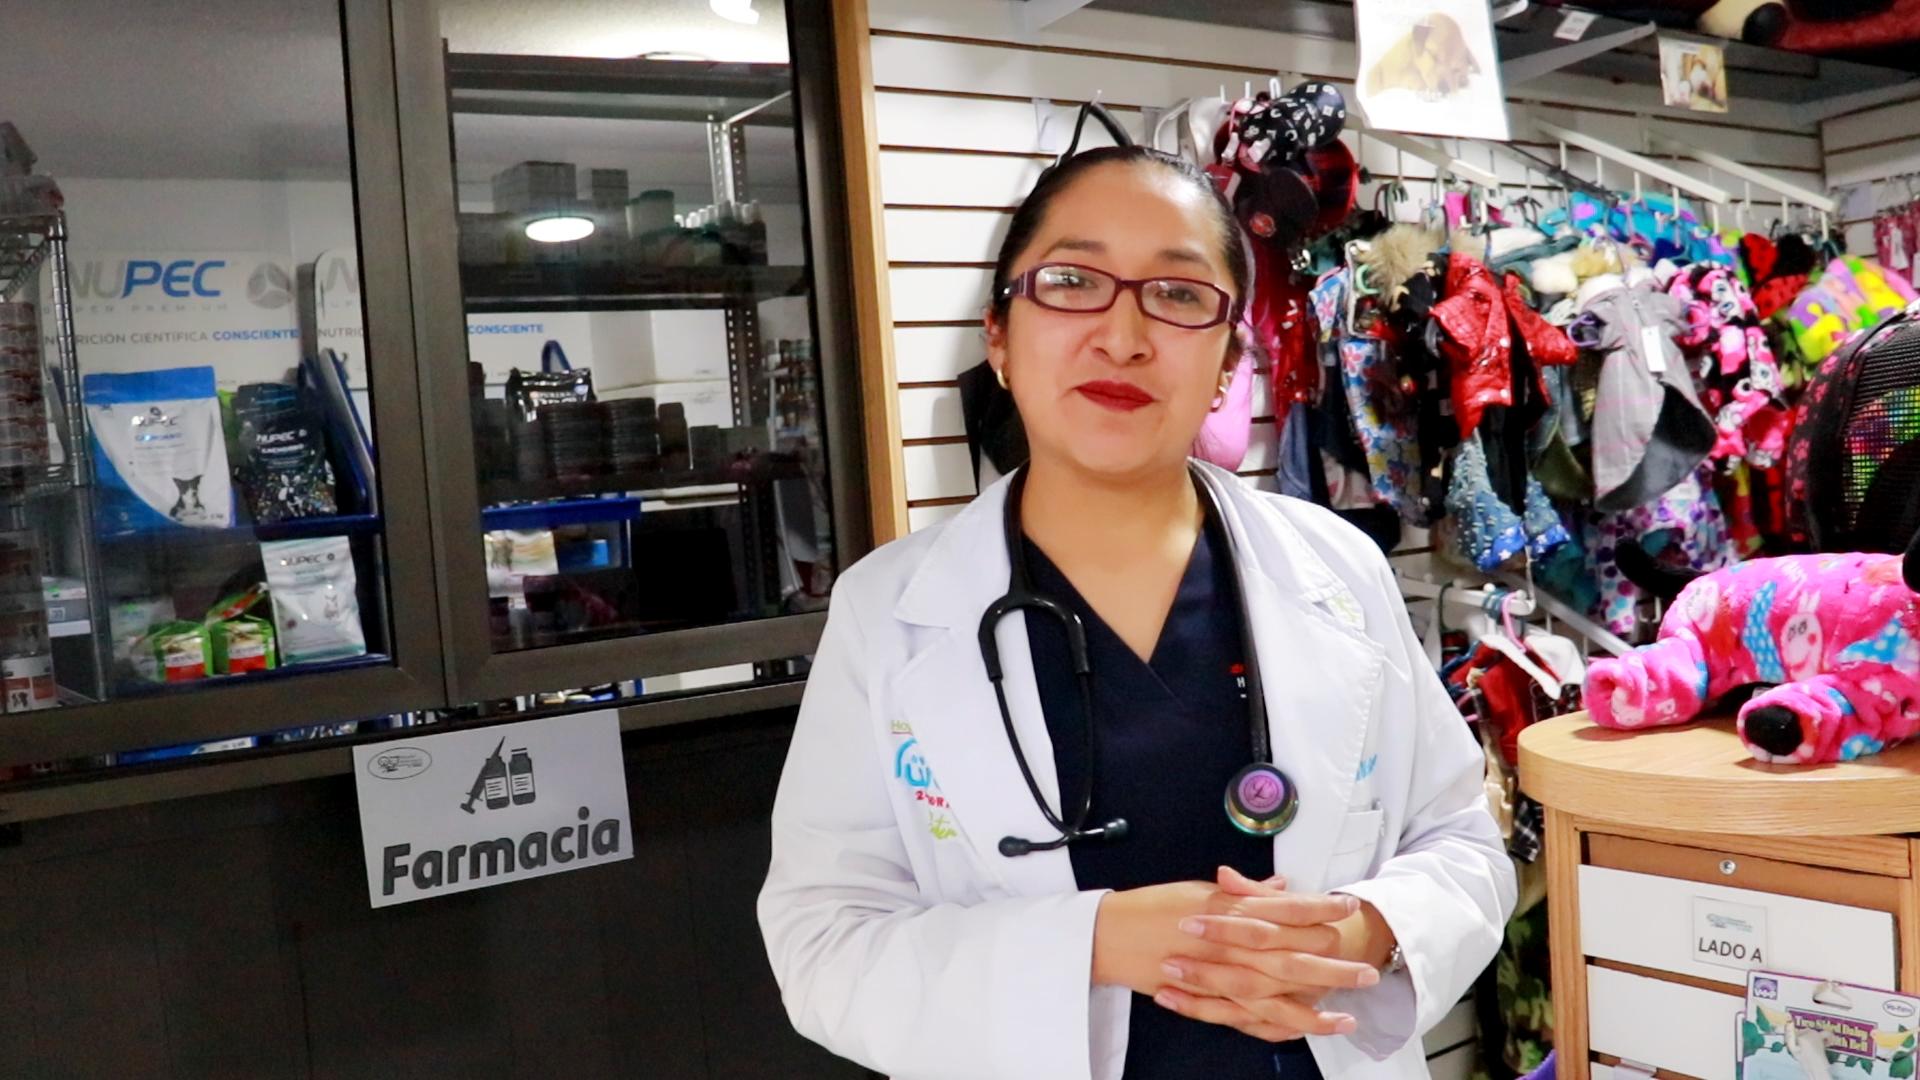 Medicamentos para mascotas - Farmacia